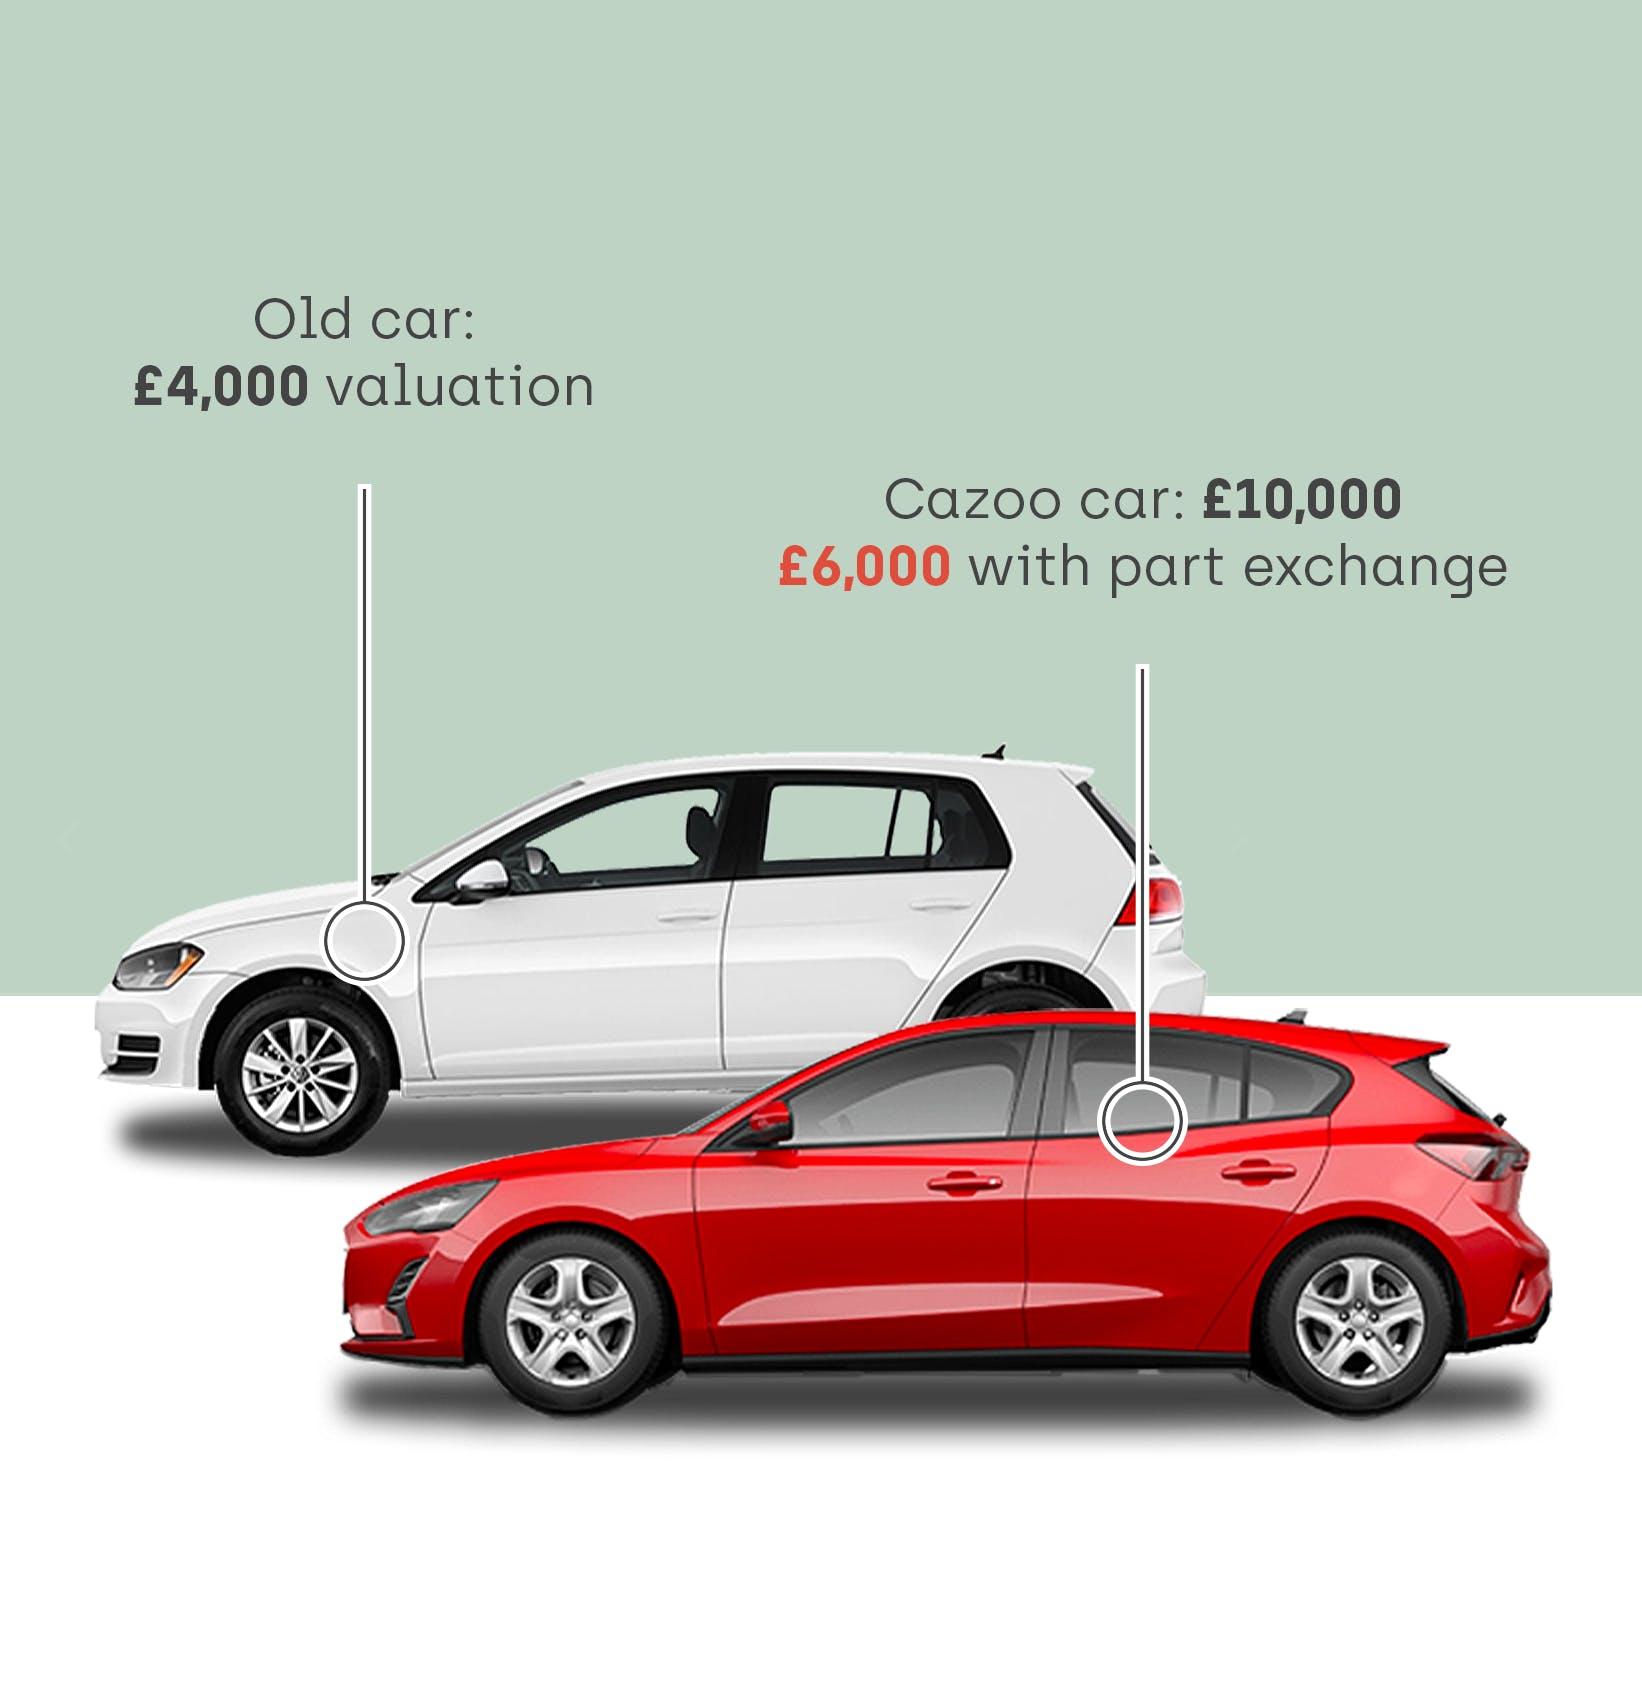 Cazoo car part exchange valuation